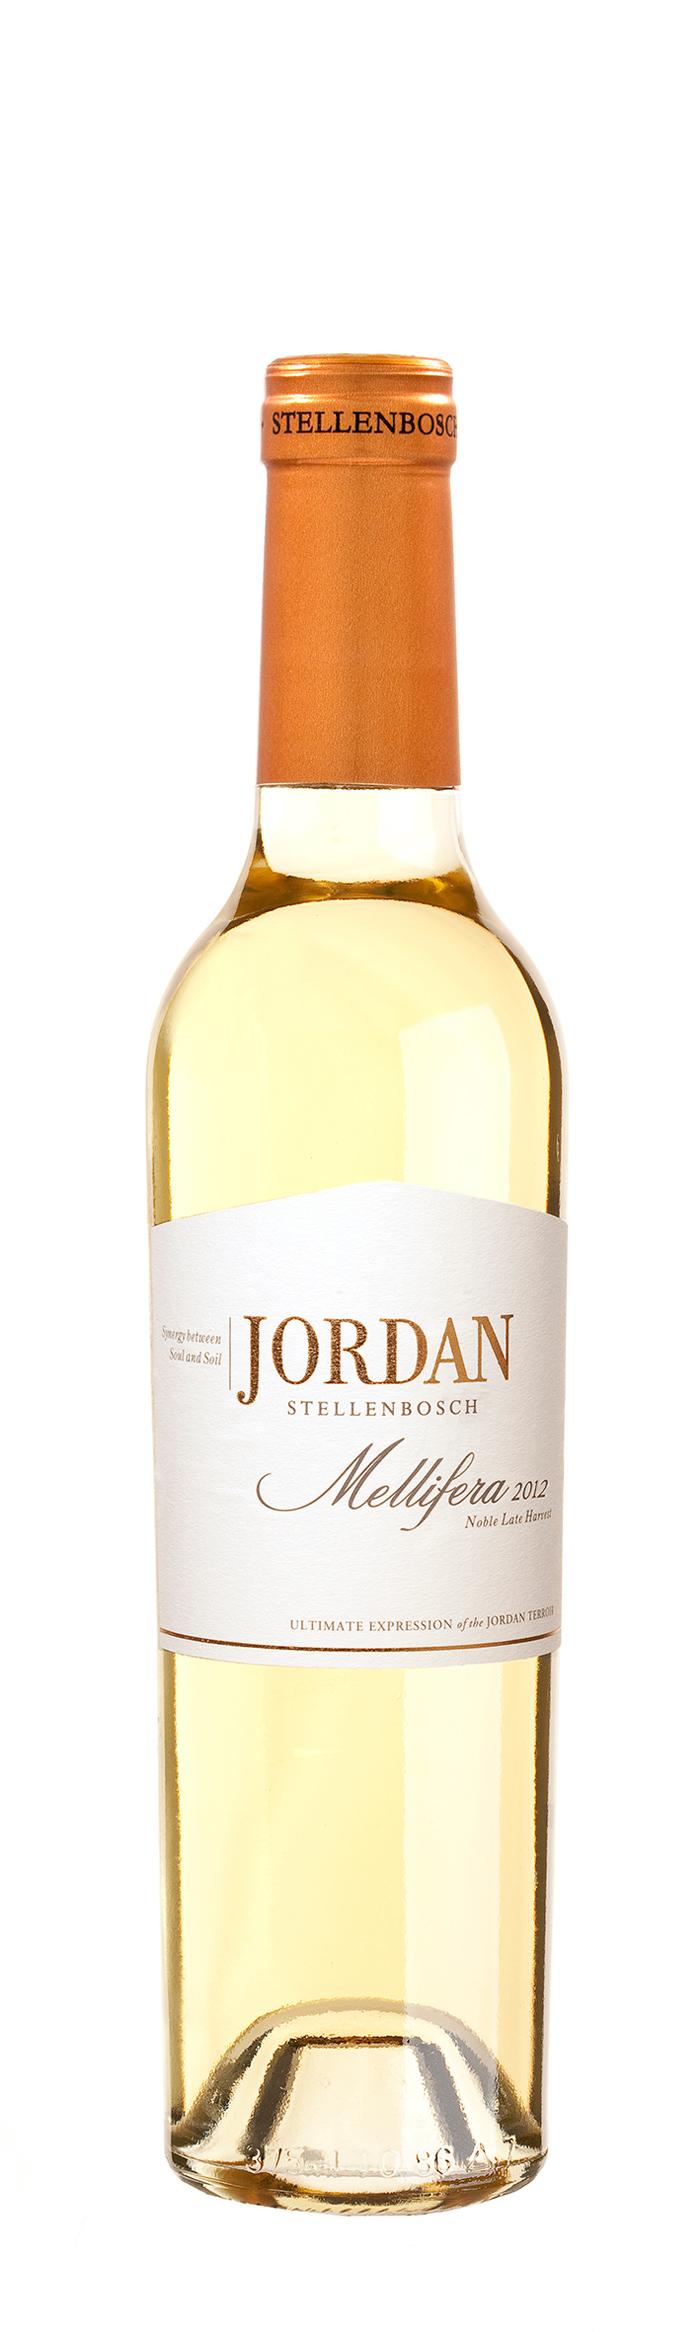 The Jordan Mellifera 2012 vintage